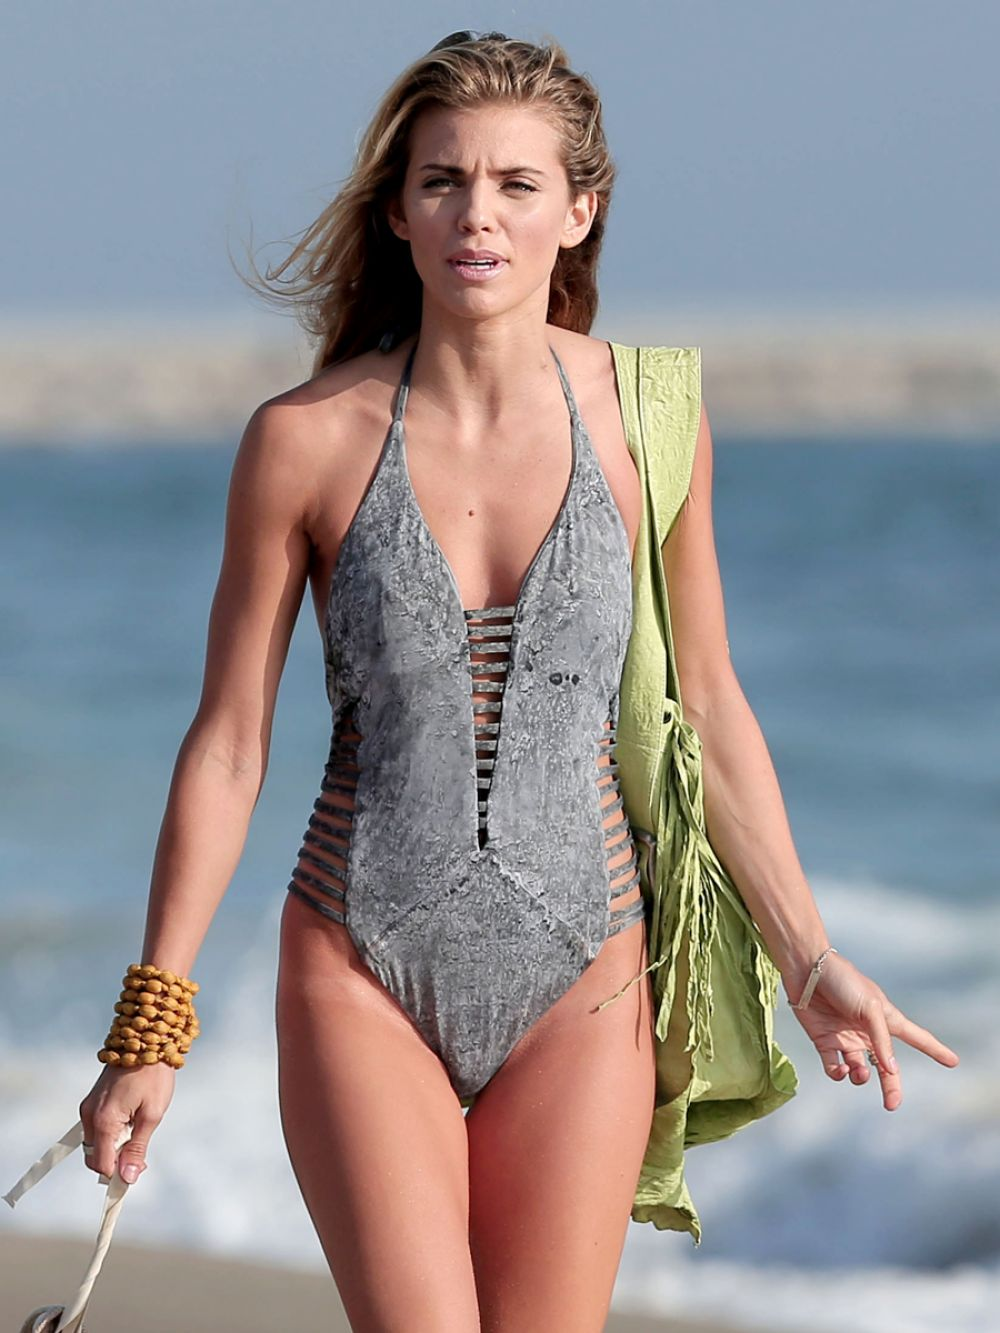 Bikini AnnaLynne McCord nude (32 photo), Sexy, Cleavage, Twitter, swimsuit 2020